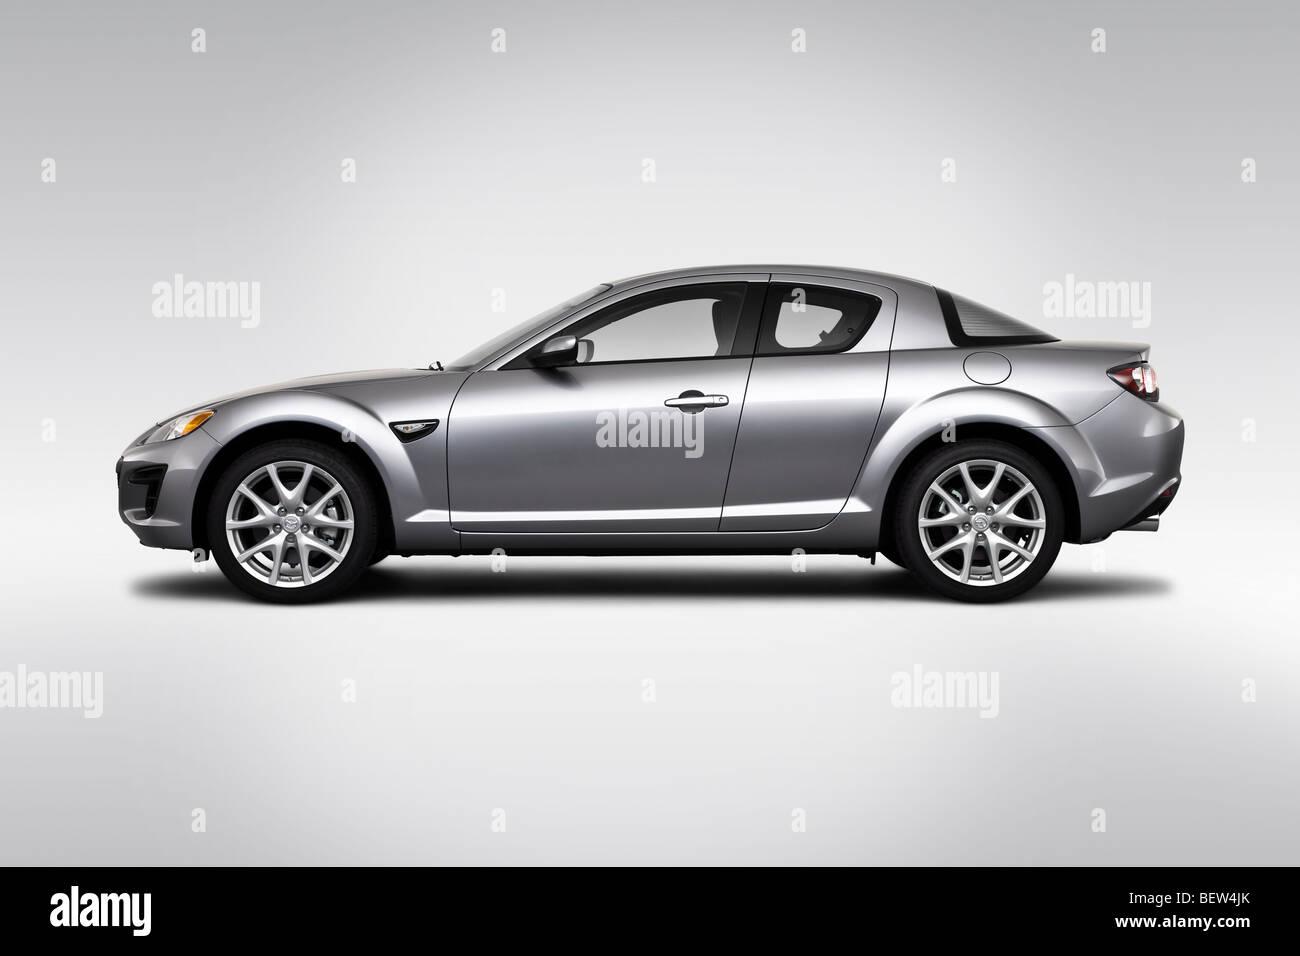 2010 mazda rx-8 sport in silver - drivers side profile stock photo